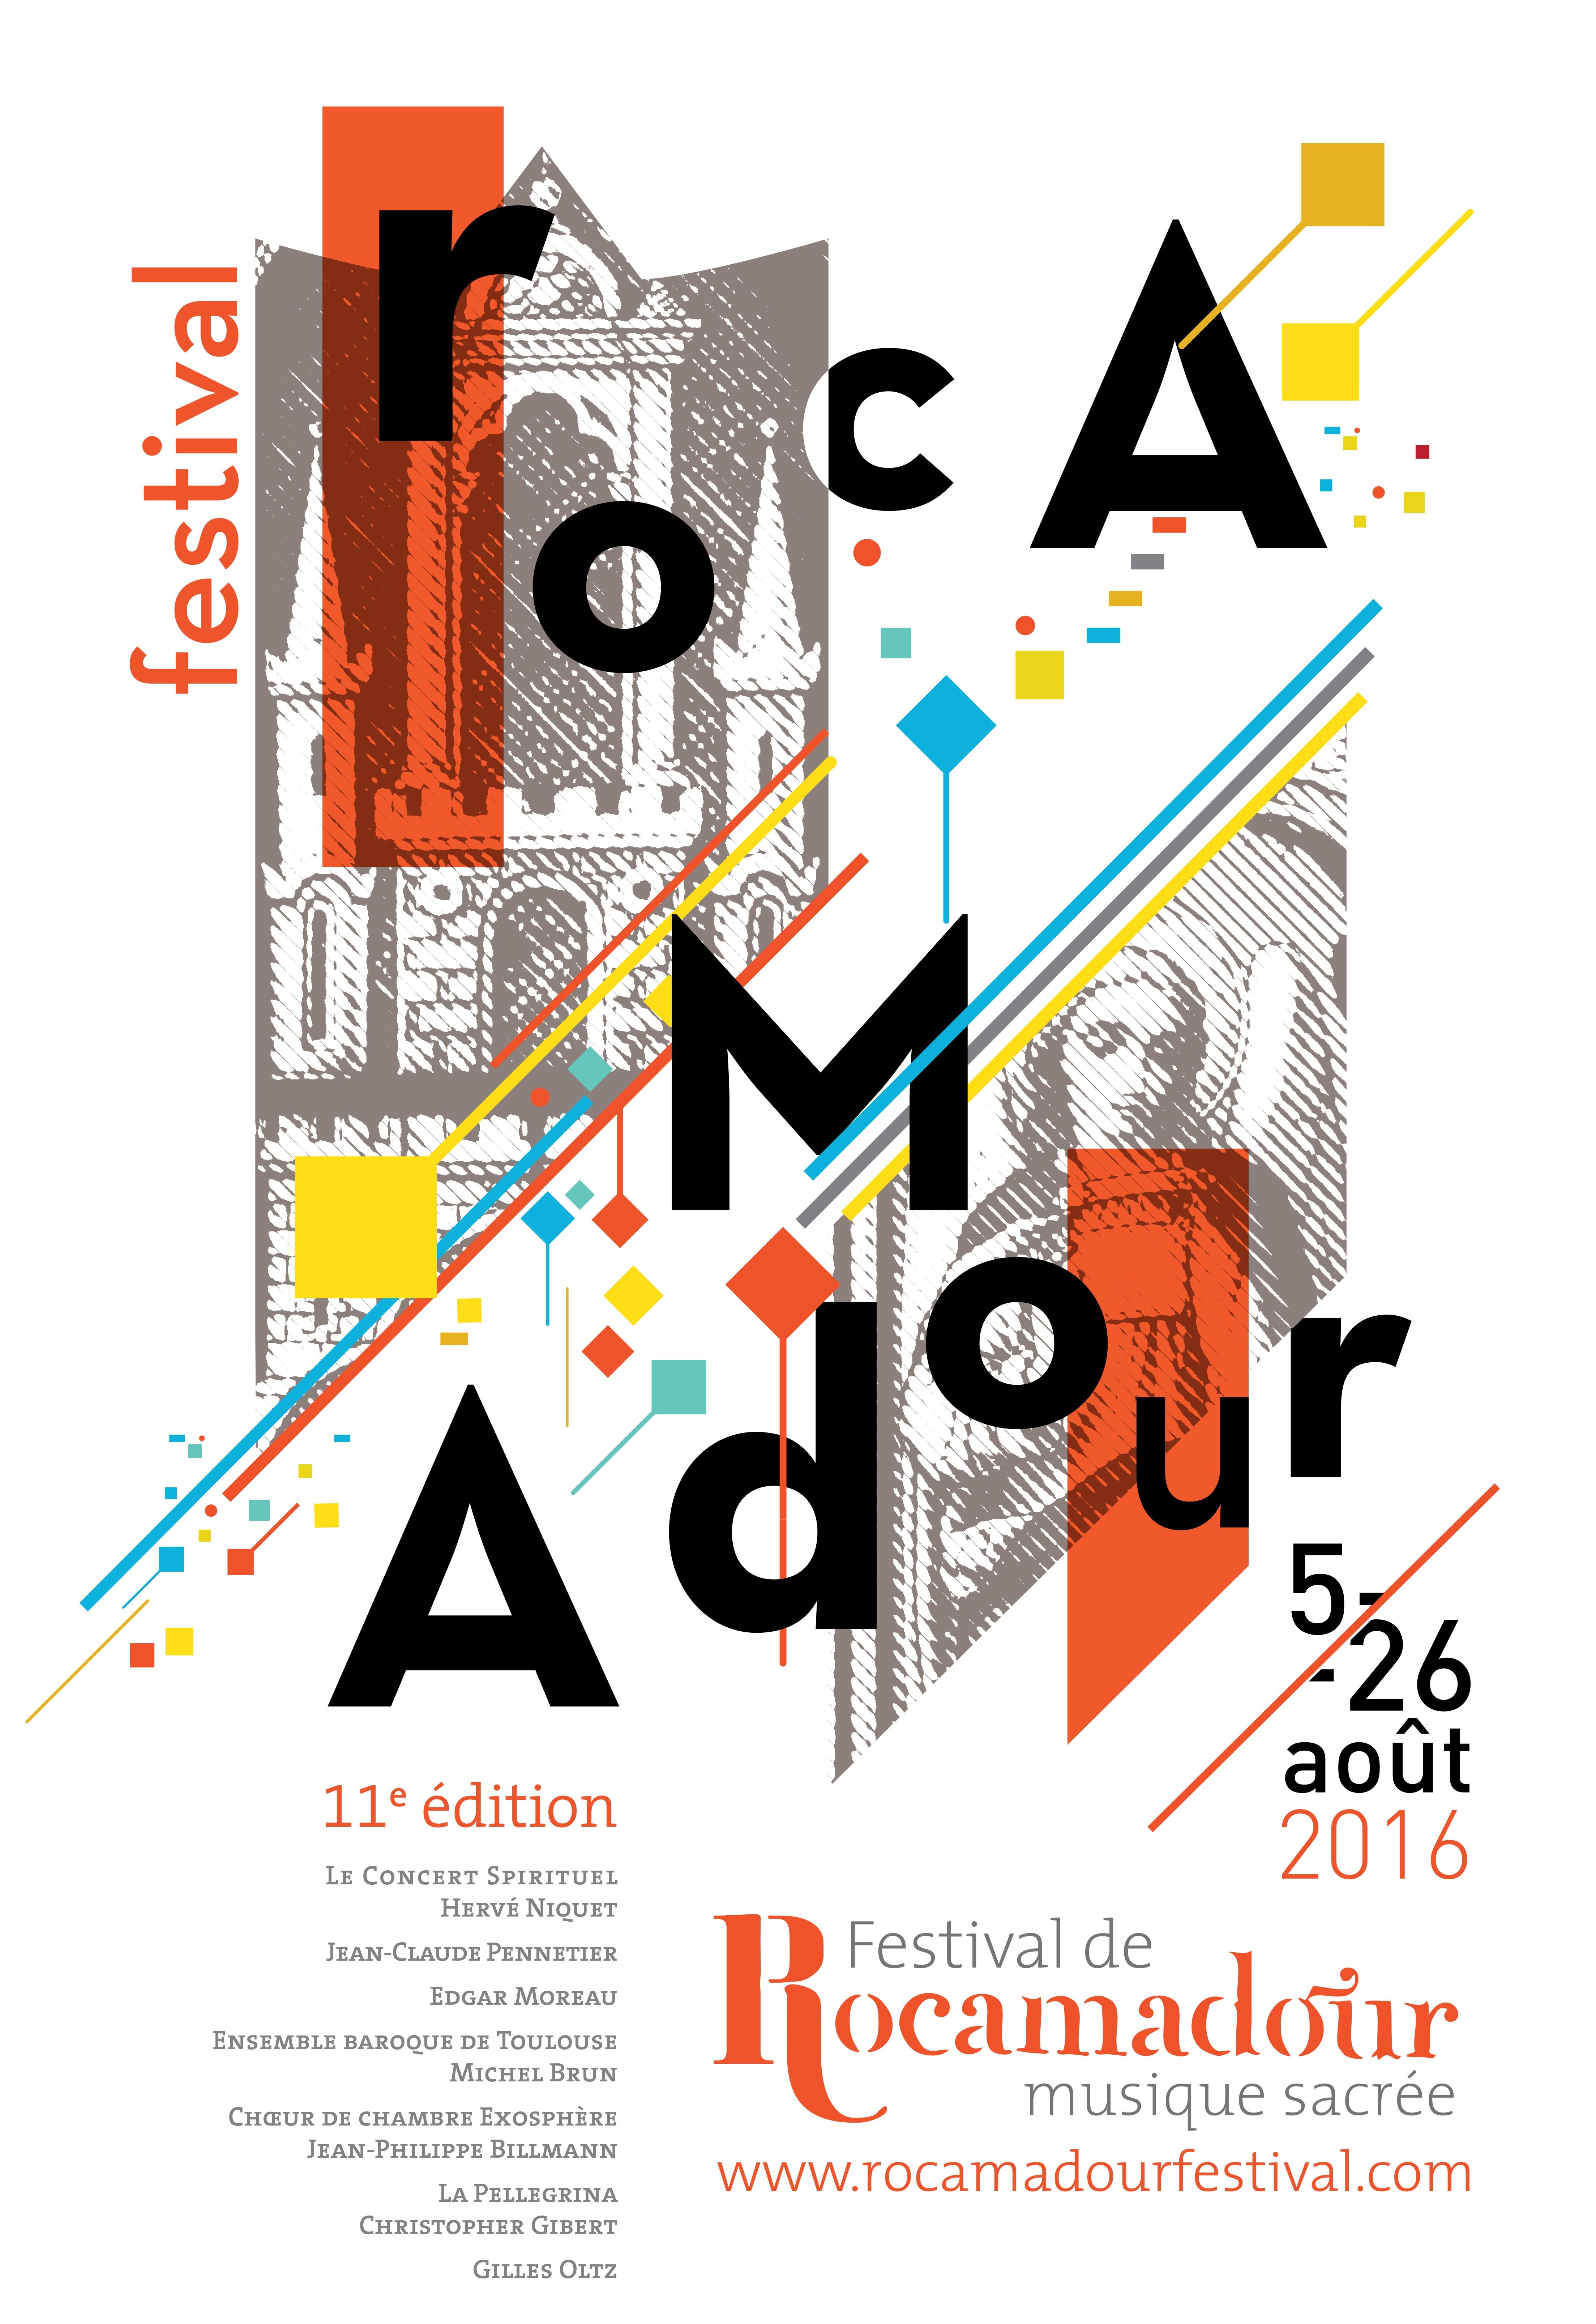 Decaux-FestivalROCAMADOUR-OK